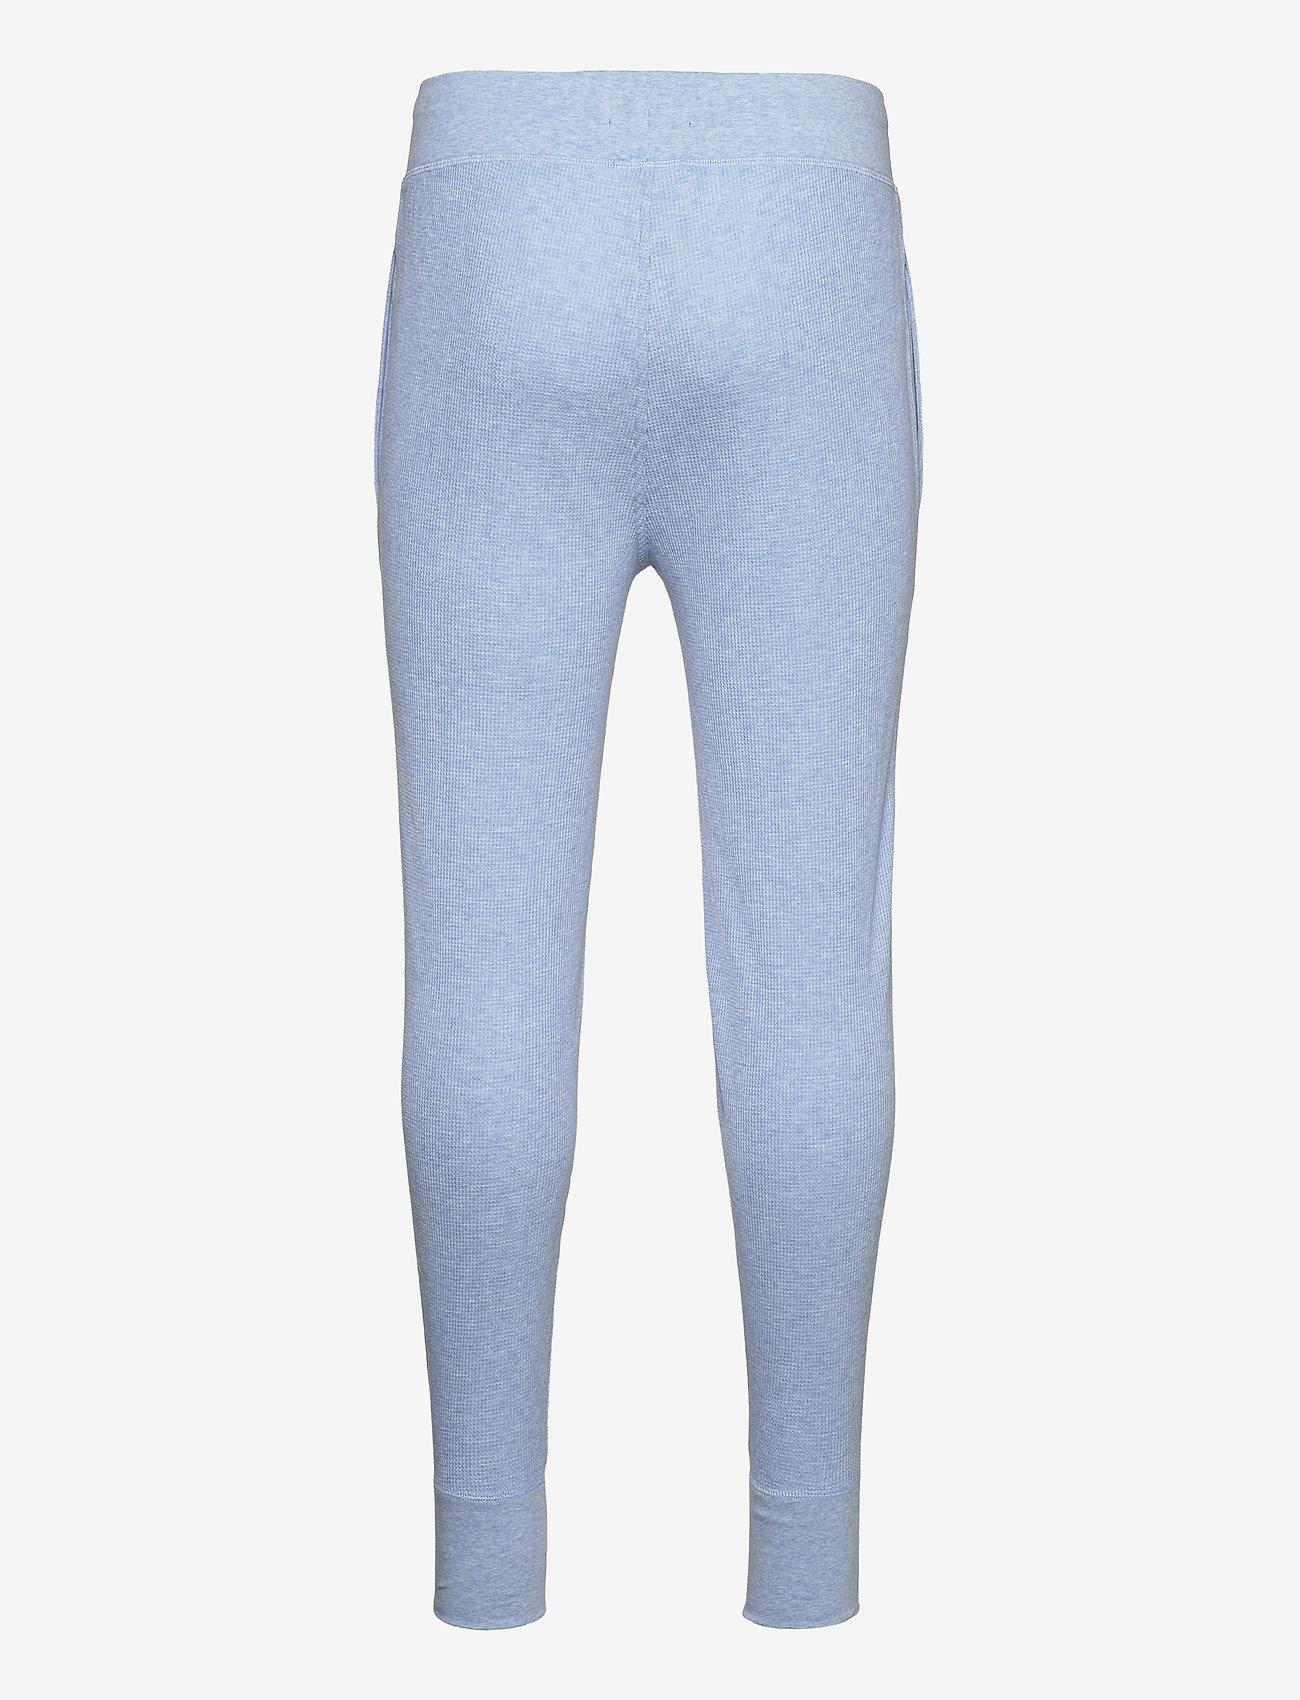 Polo Ralph Lauren Underwear - WAFFLE-SPN-SLB - bottoms - new powder blue h - 1